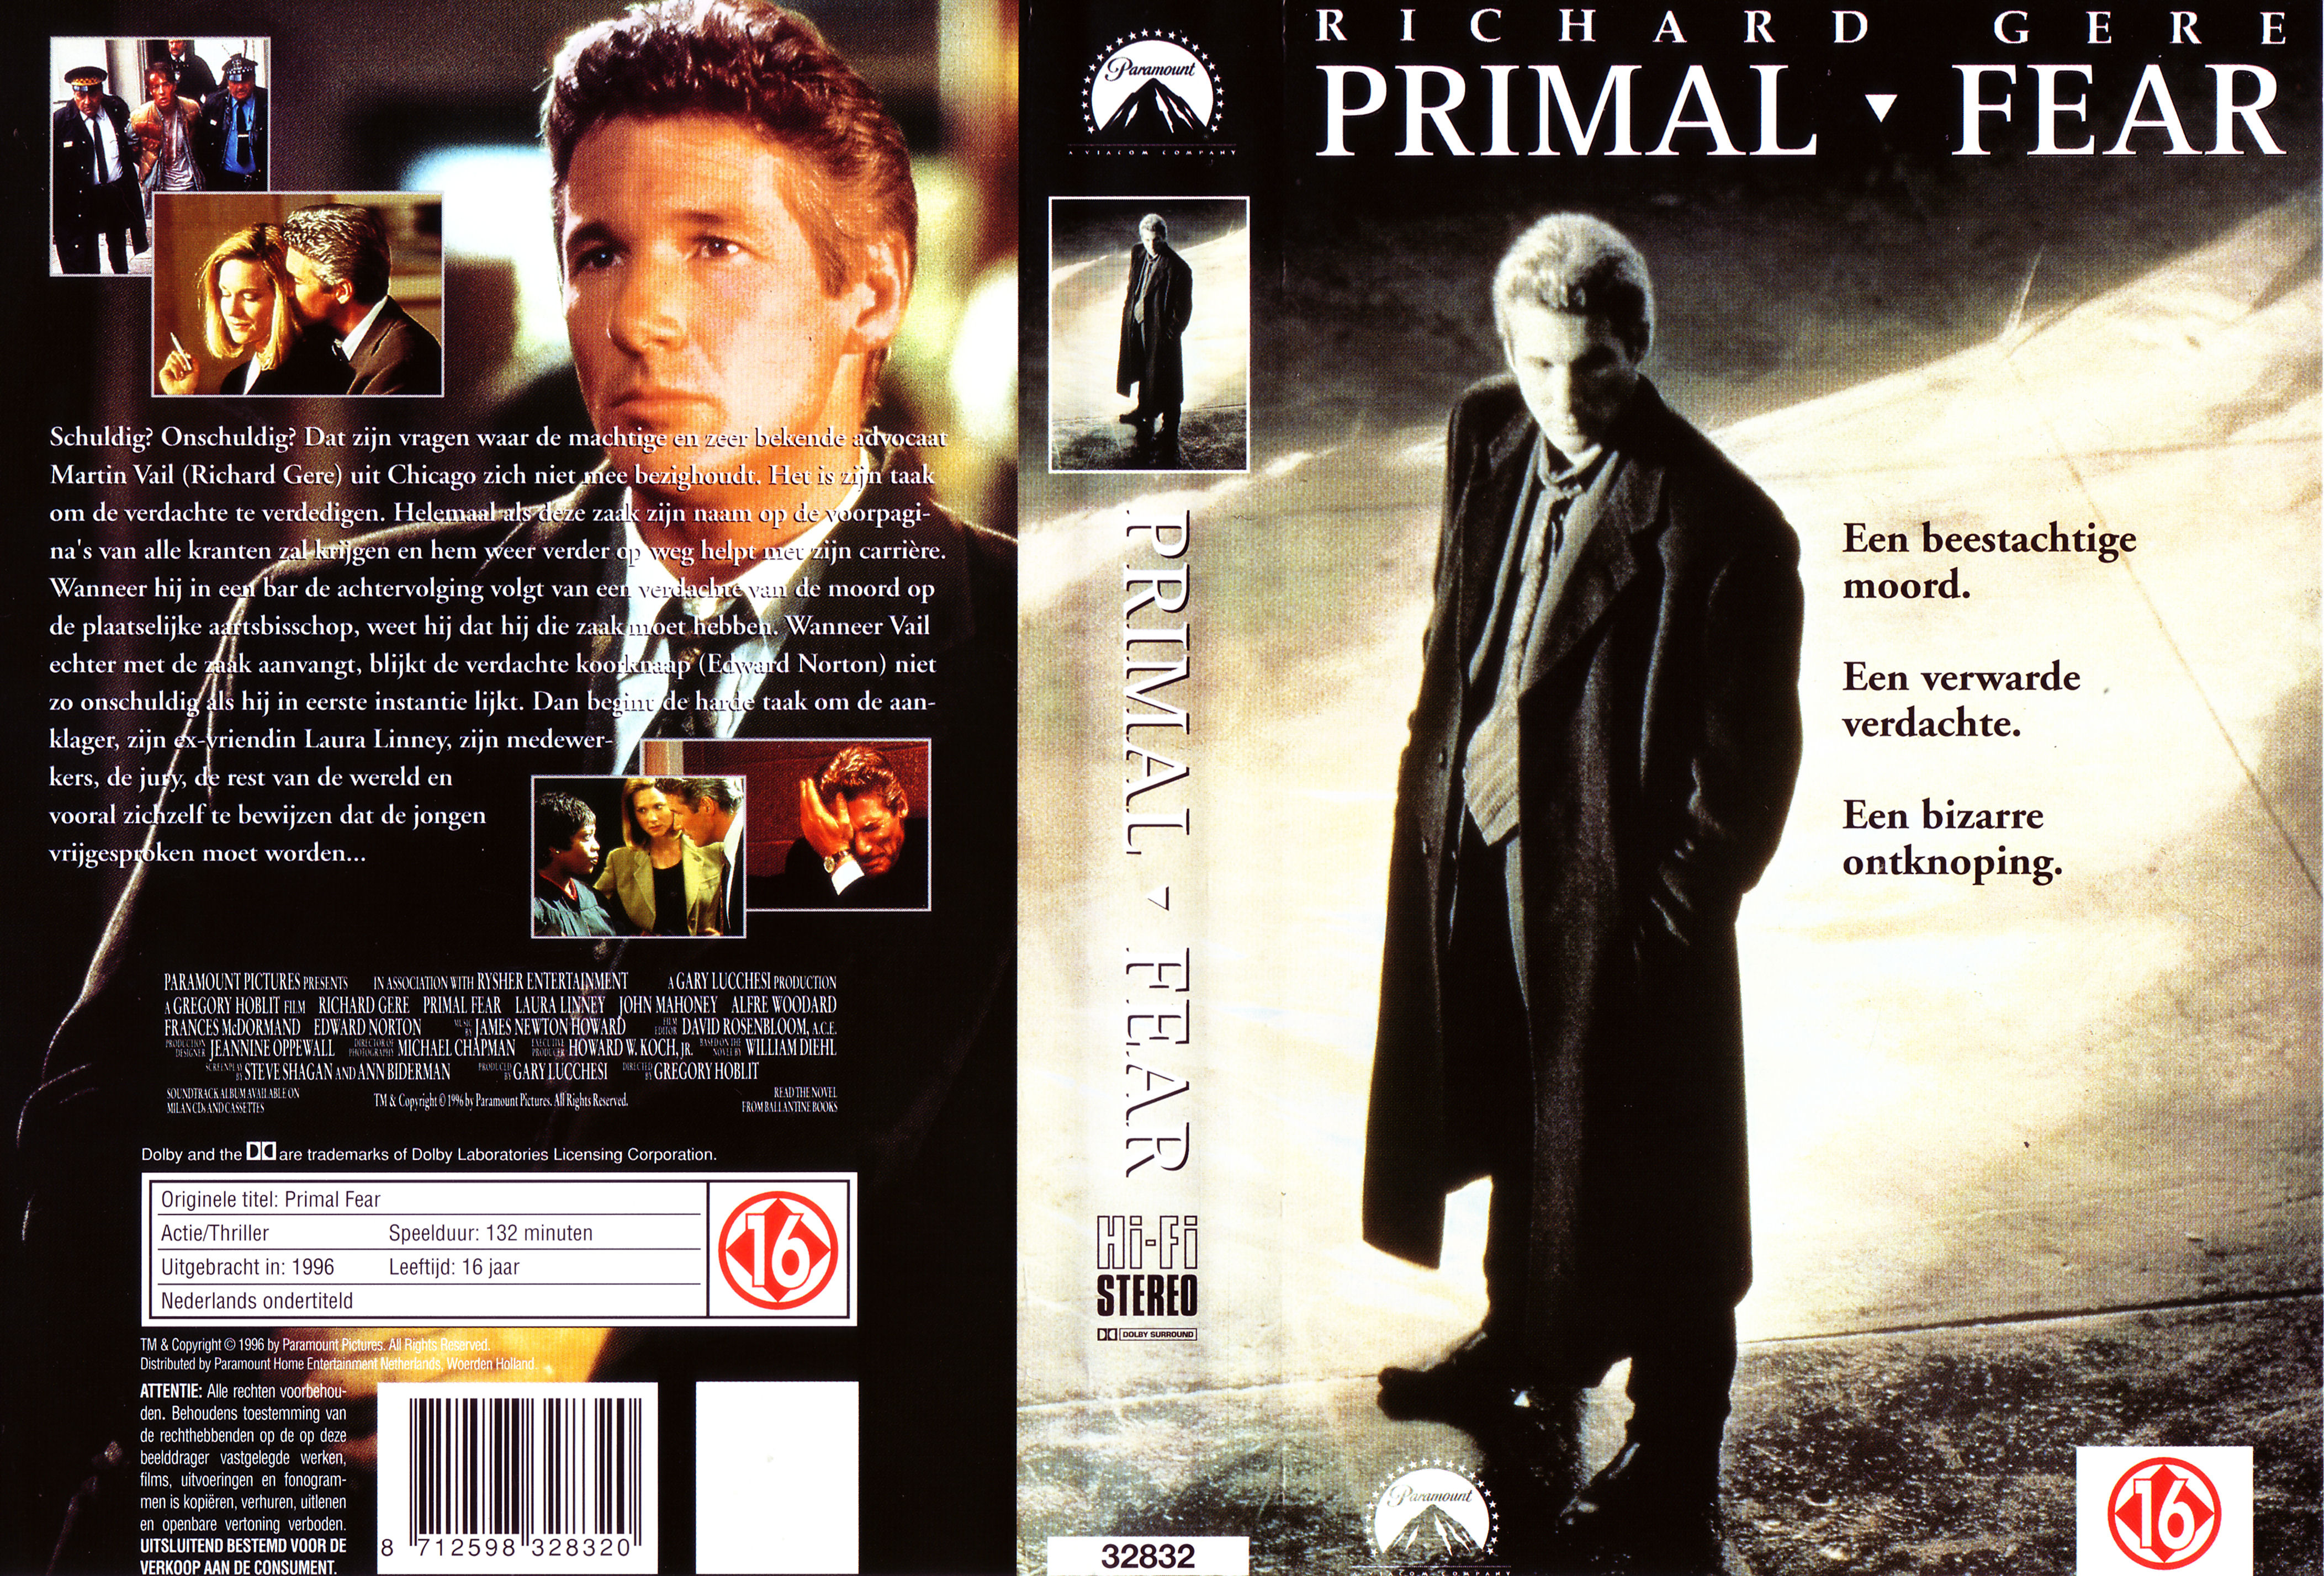 Primal Fear 1996 COVERS.BOX.SK ::: Prim...